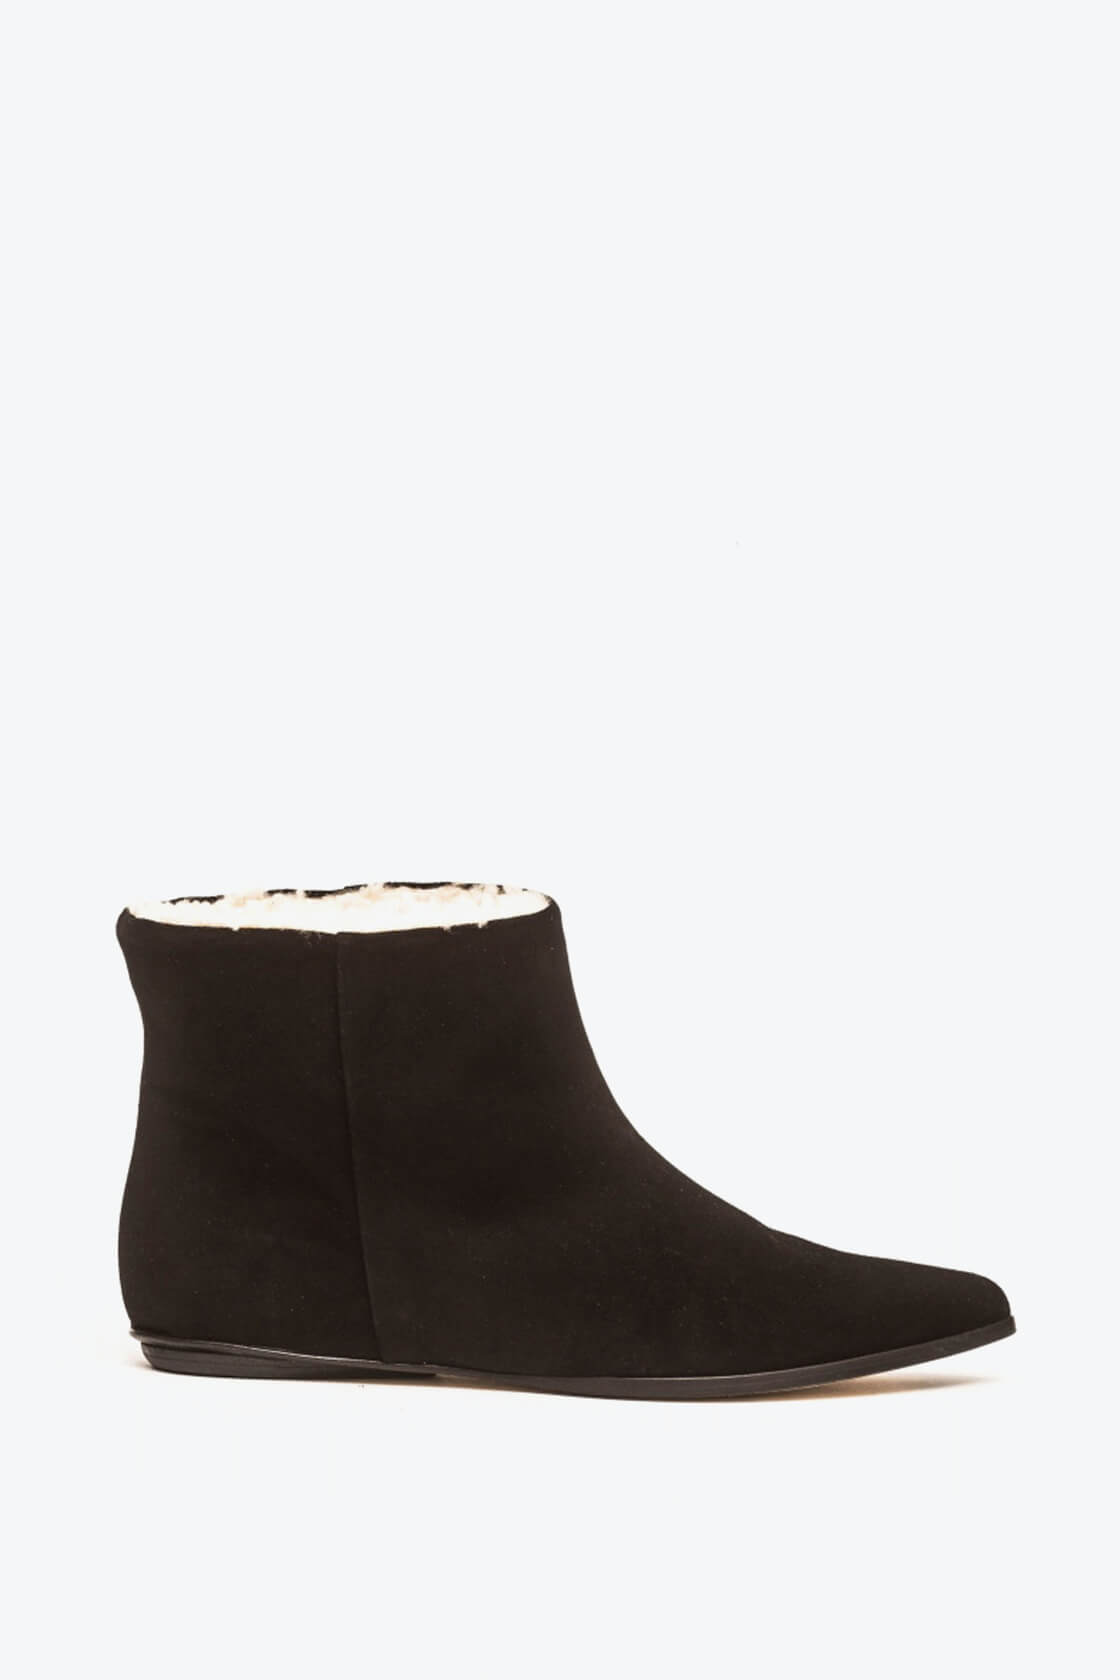 EJK0000059 Zedd ankle boots black 1